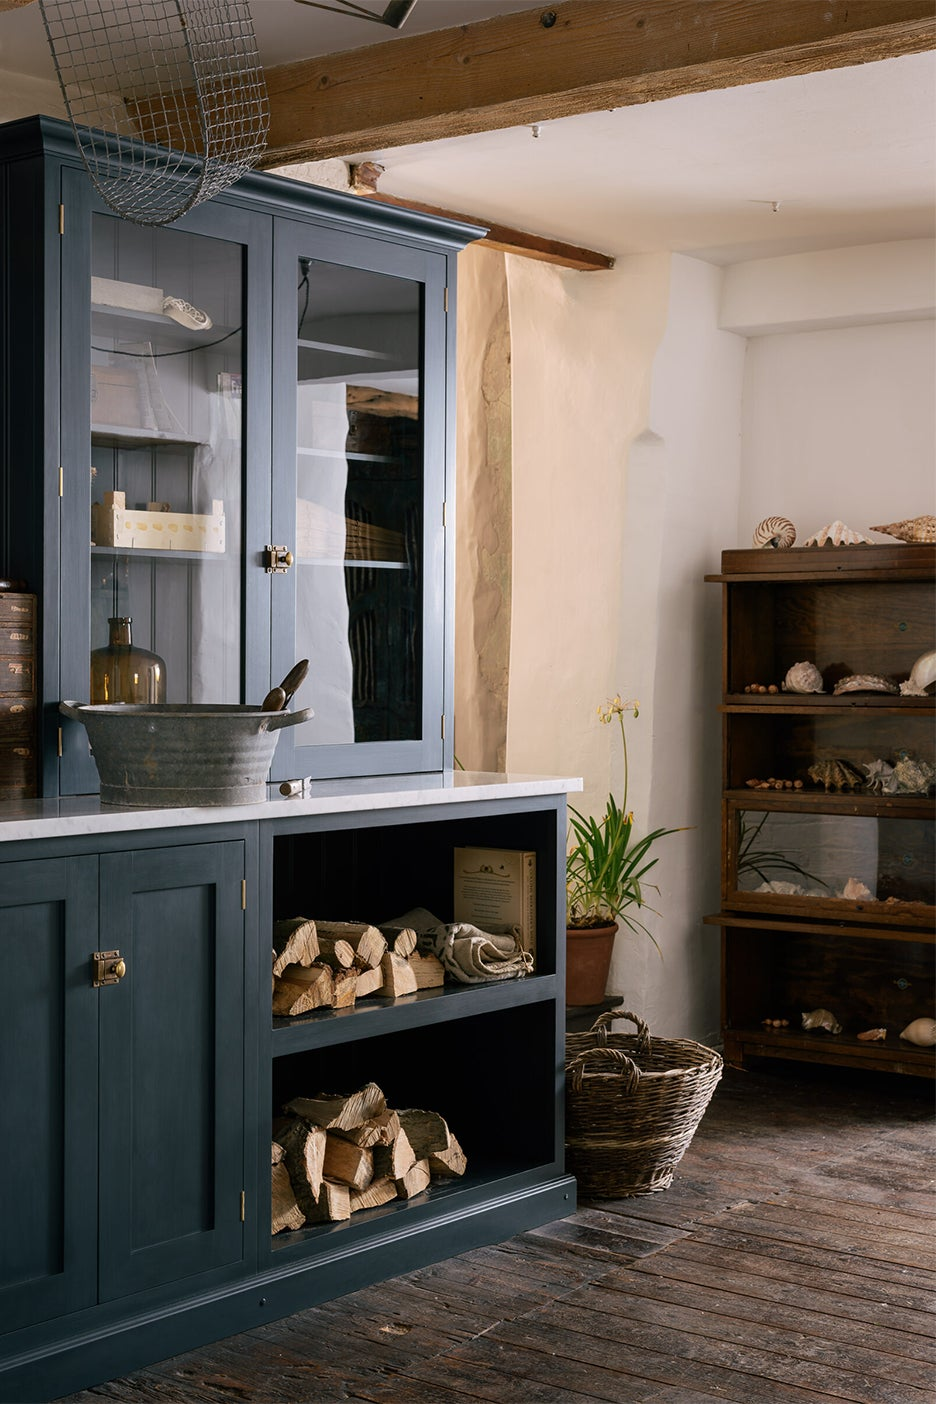 fire wood in a open cabinet